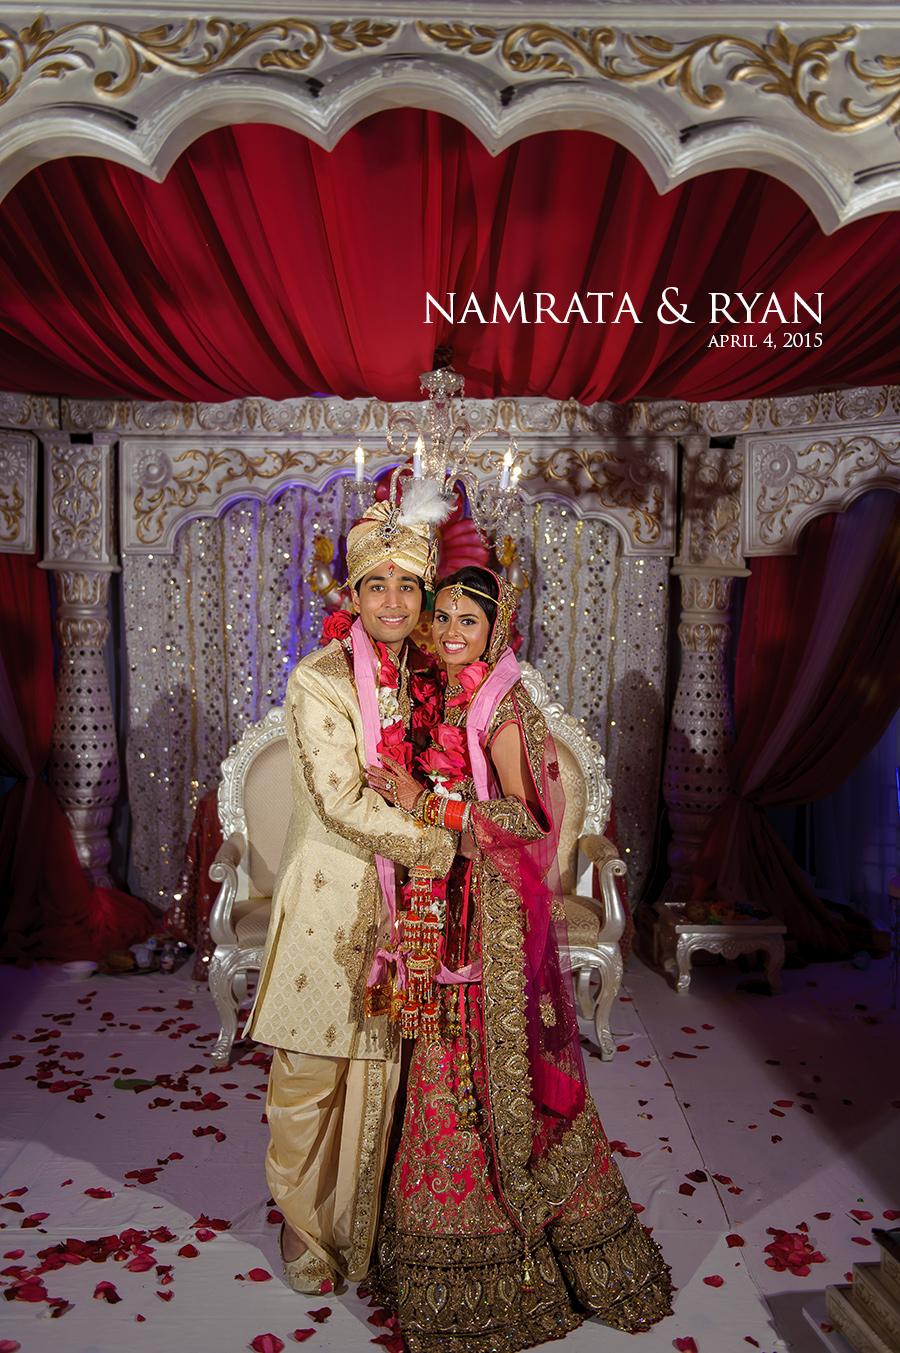 Namrata & Ryan